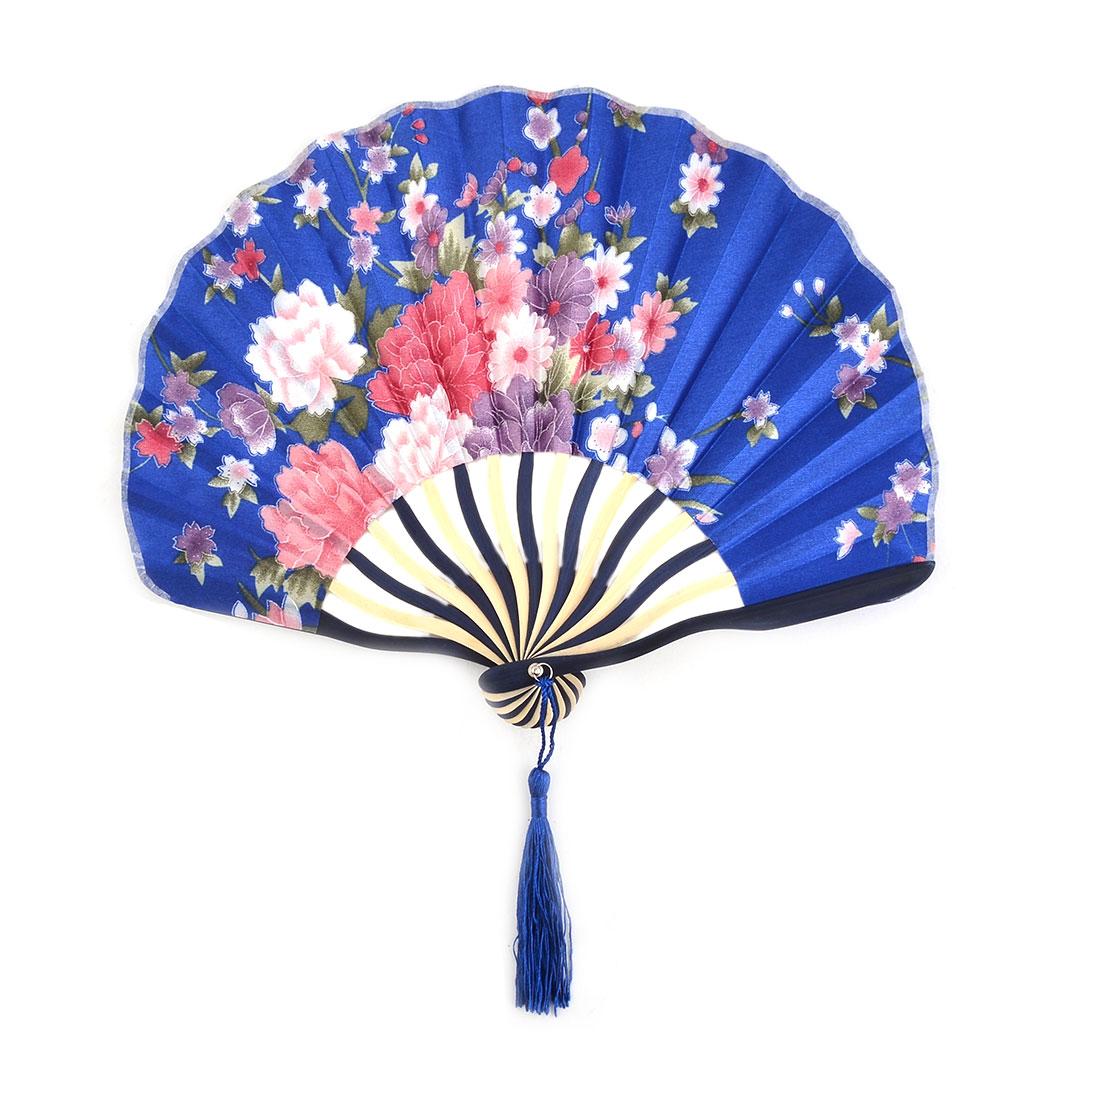 Dorm Wall Decor Polyester Floral Print Tassel Handmade Handheld Hand Fan Royal Blue